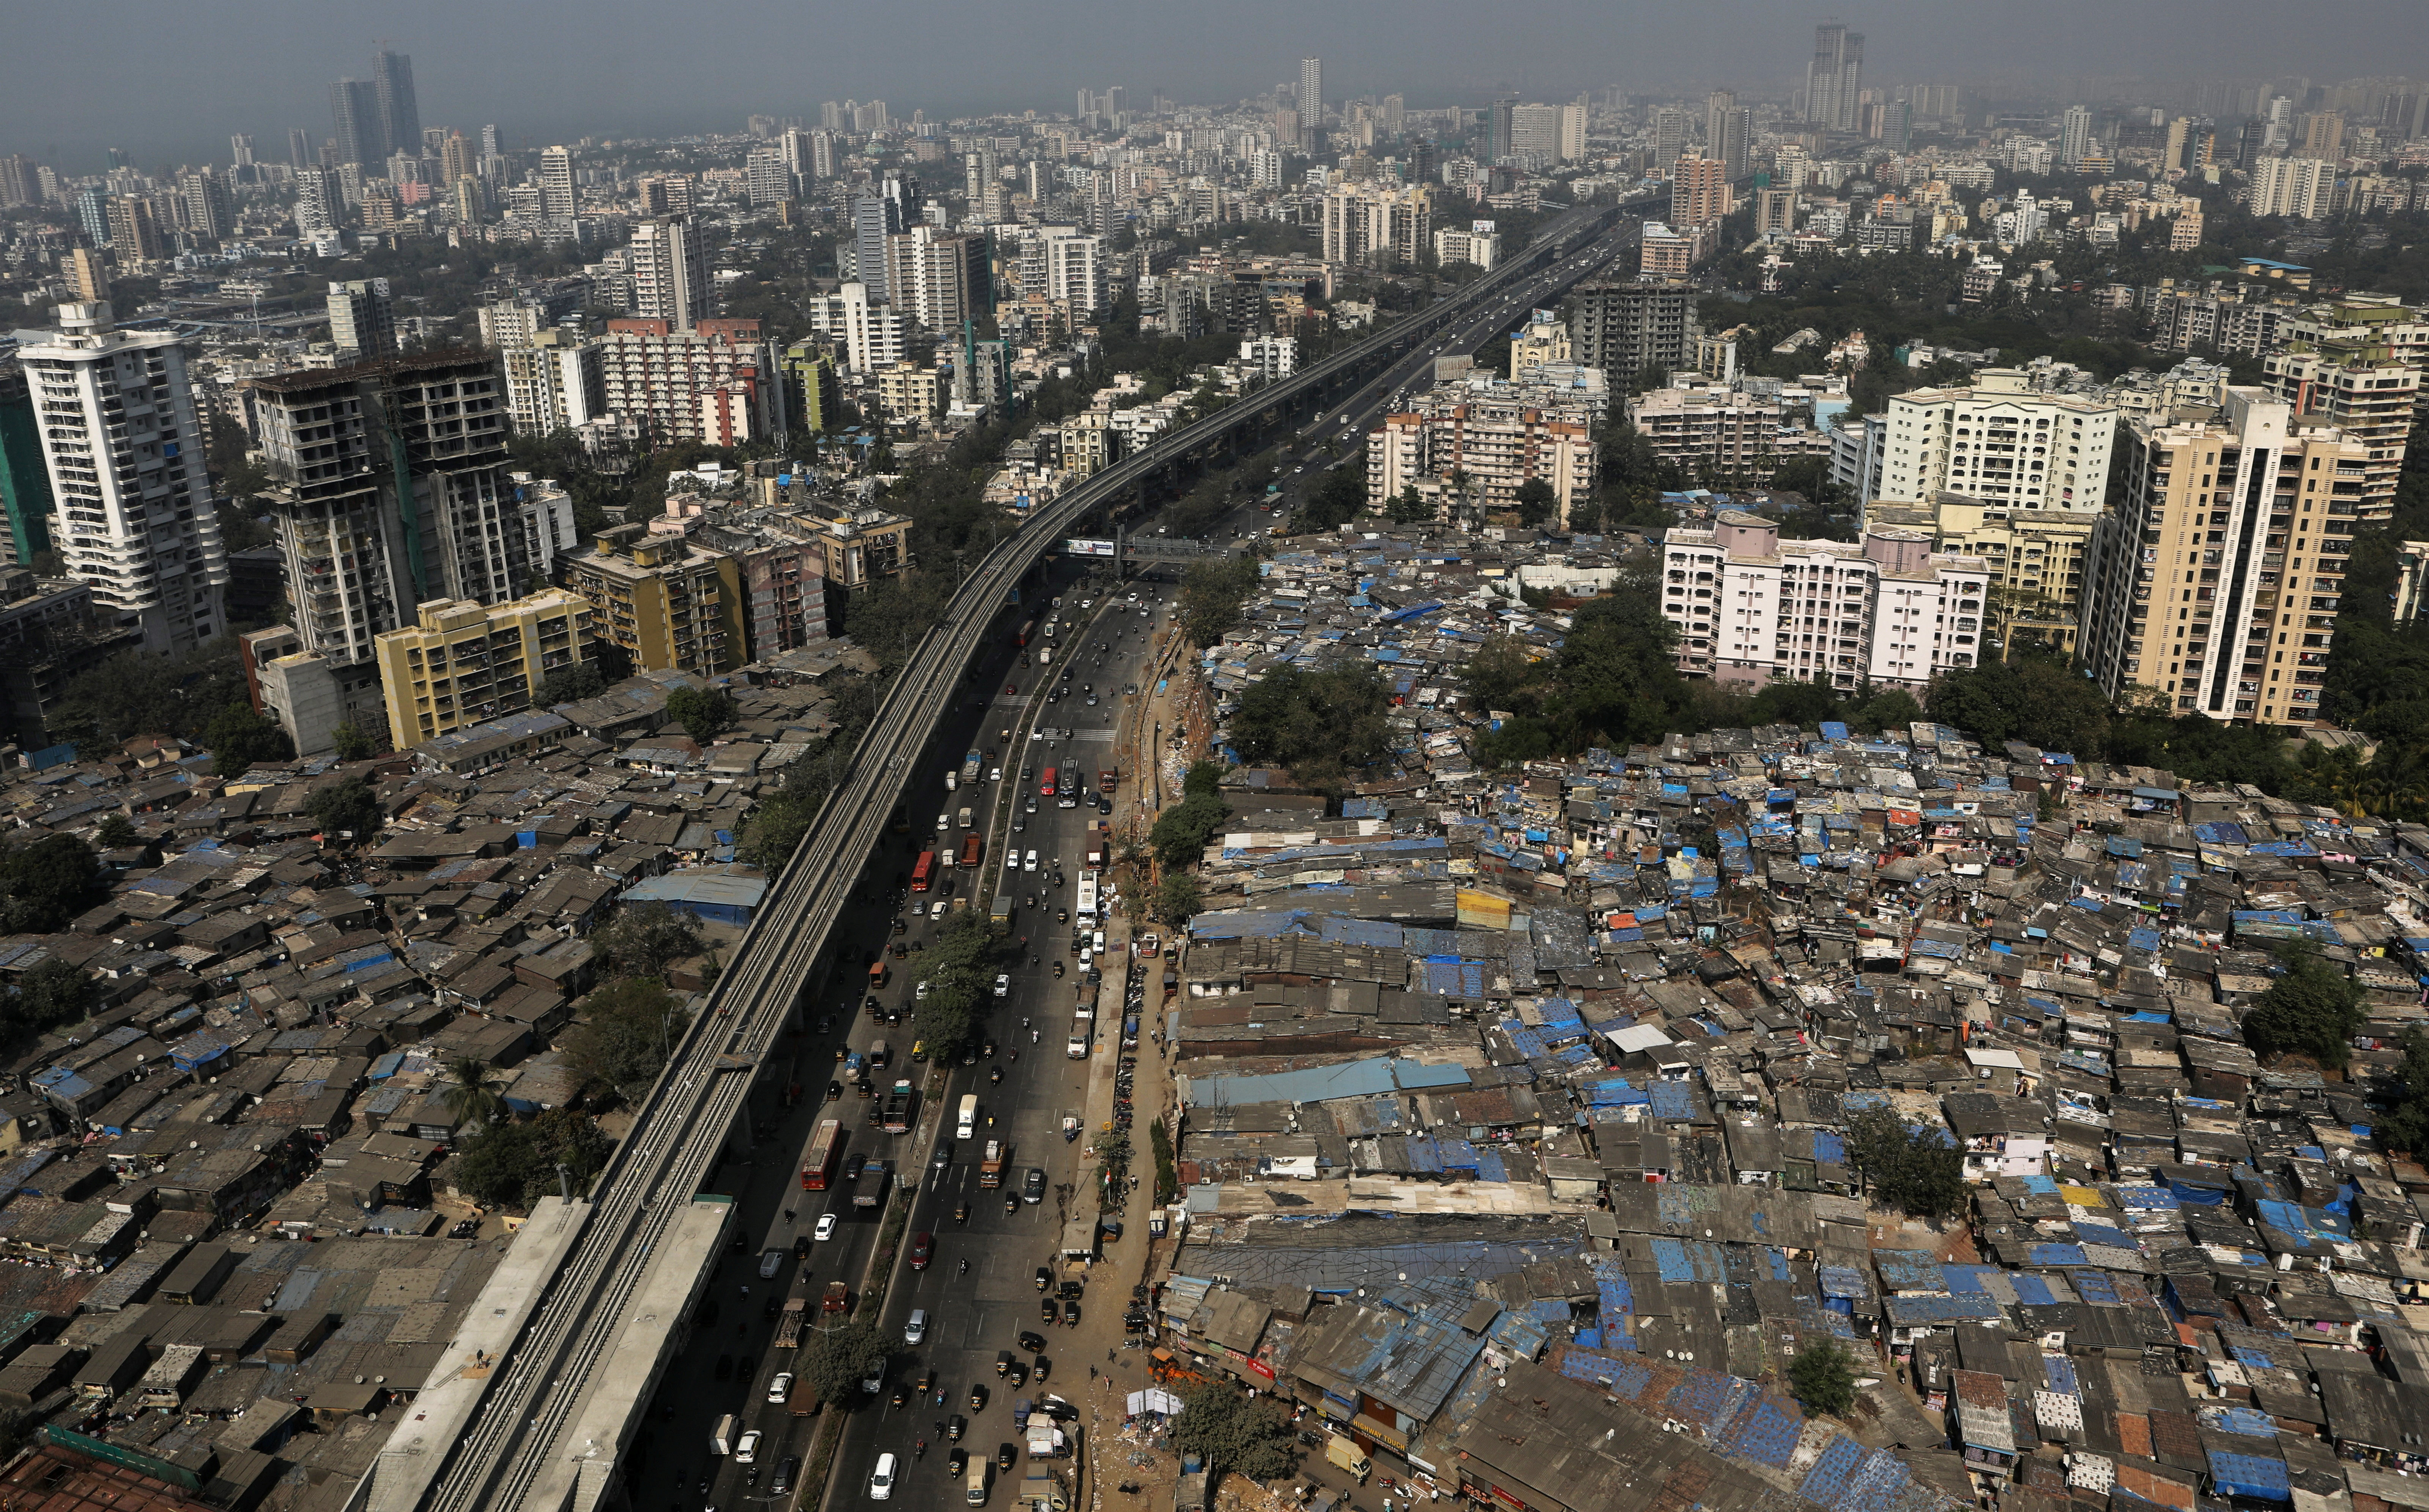 Slums and high-rise buildings in close proximity in Mumbai, India.